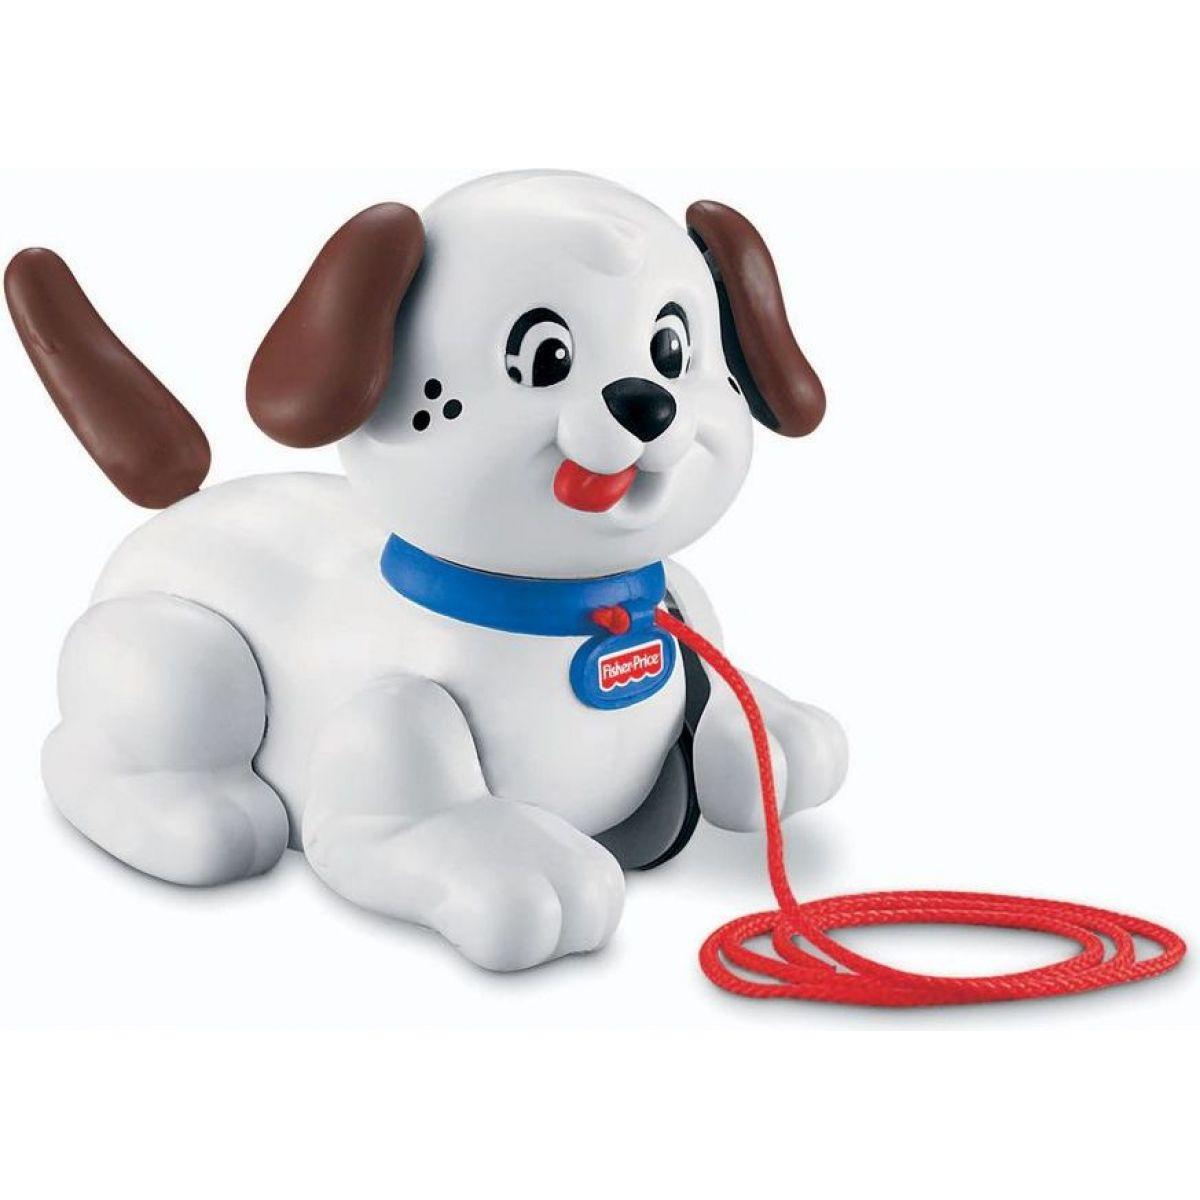 Fisher Price Tahací Snoopy - Bílá